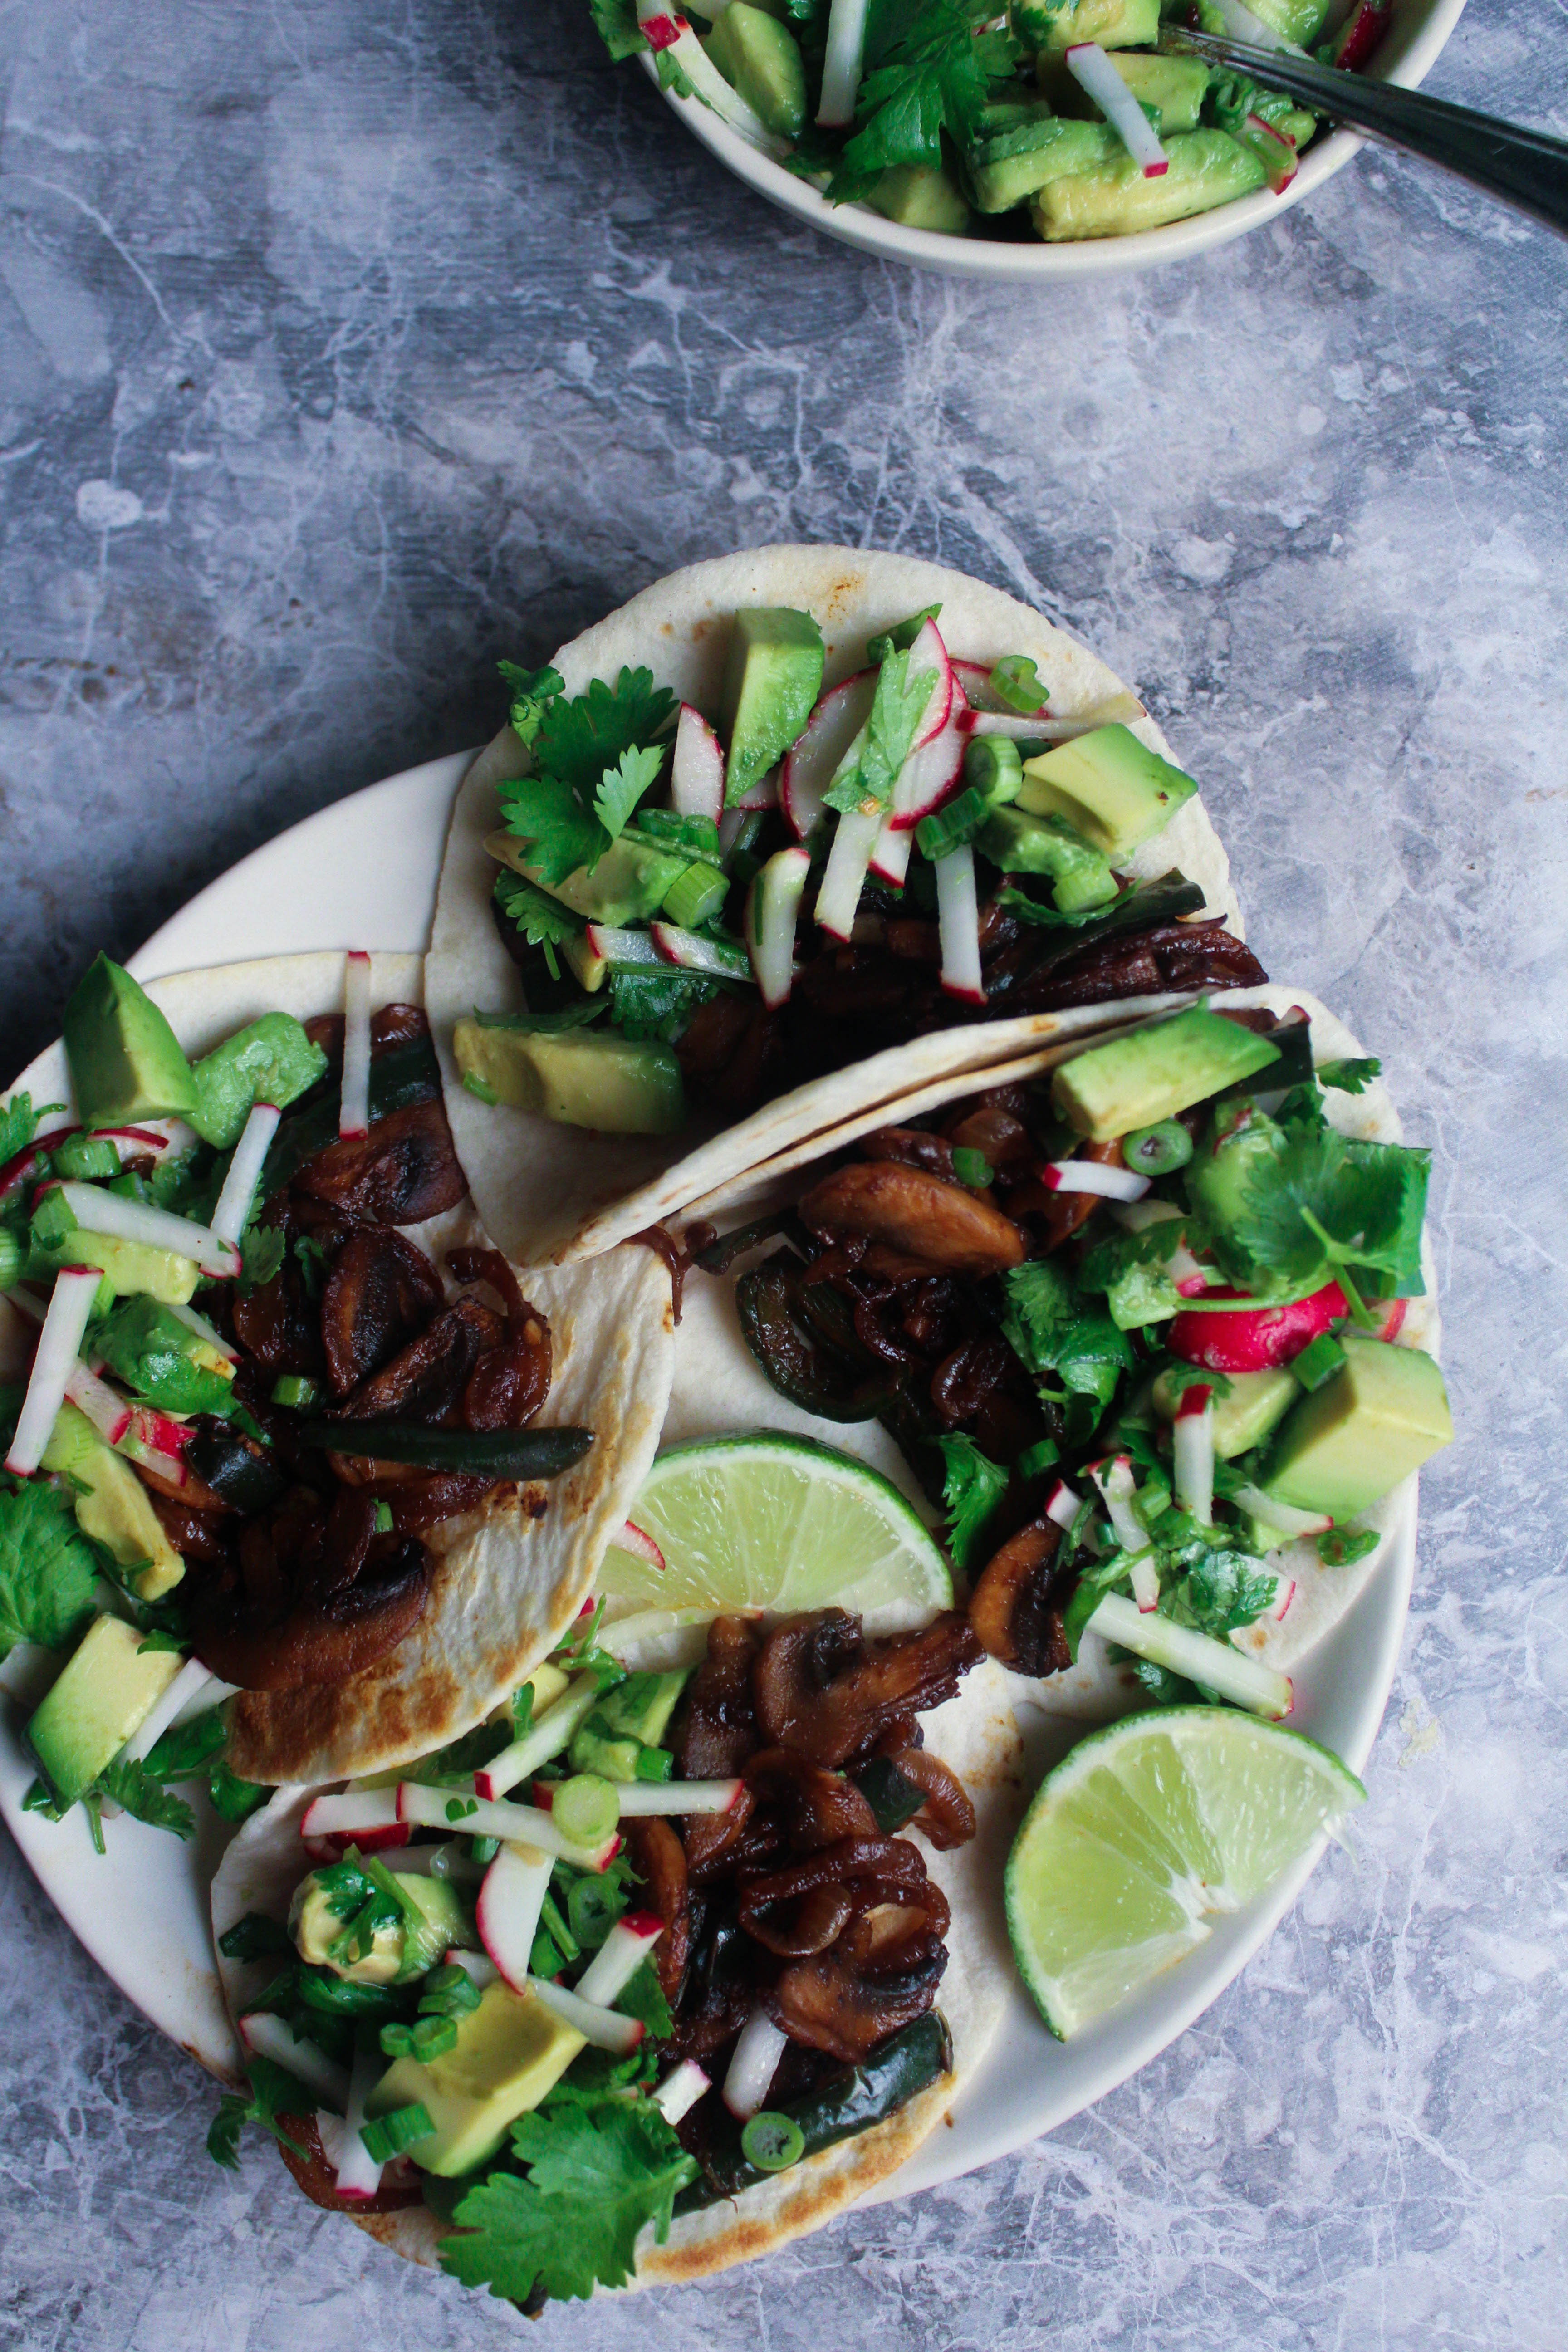 Smoked Mushroom and Serano Tacos w/ Avocado Radish Salsa